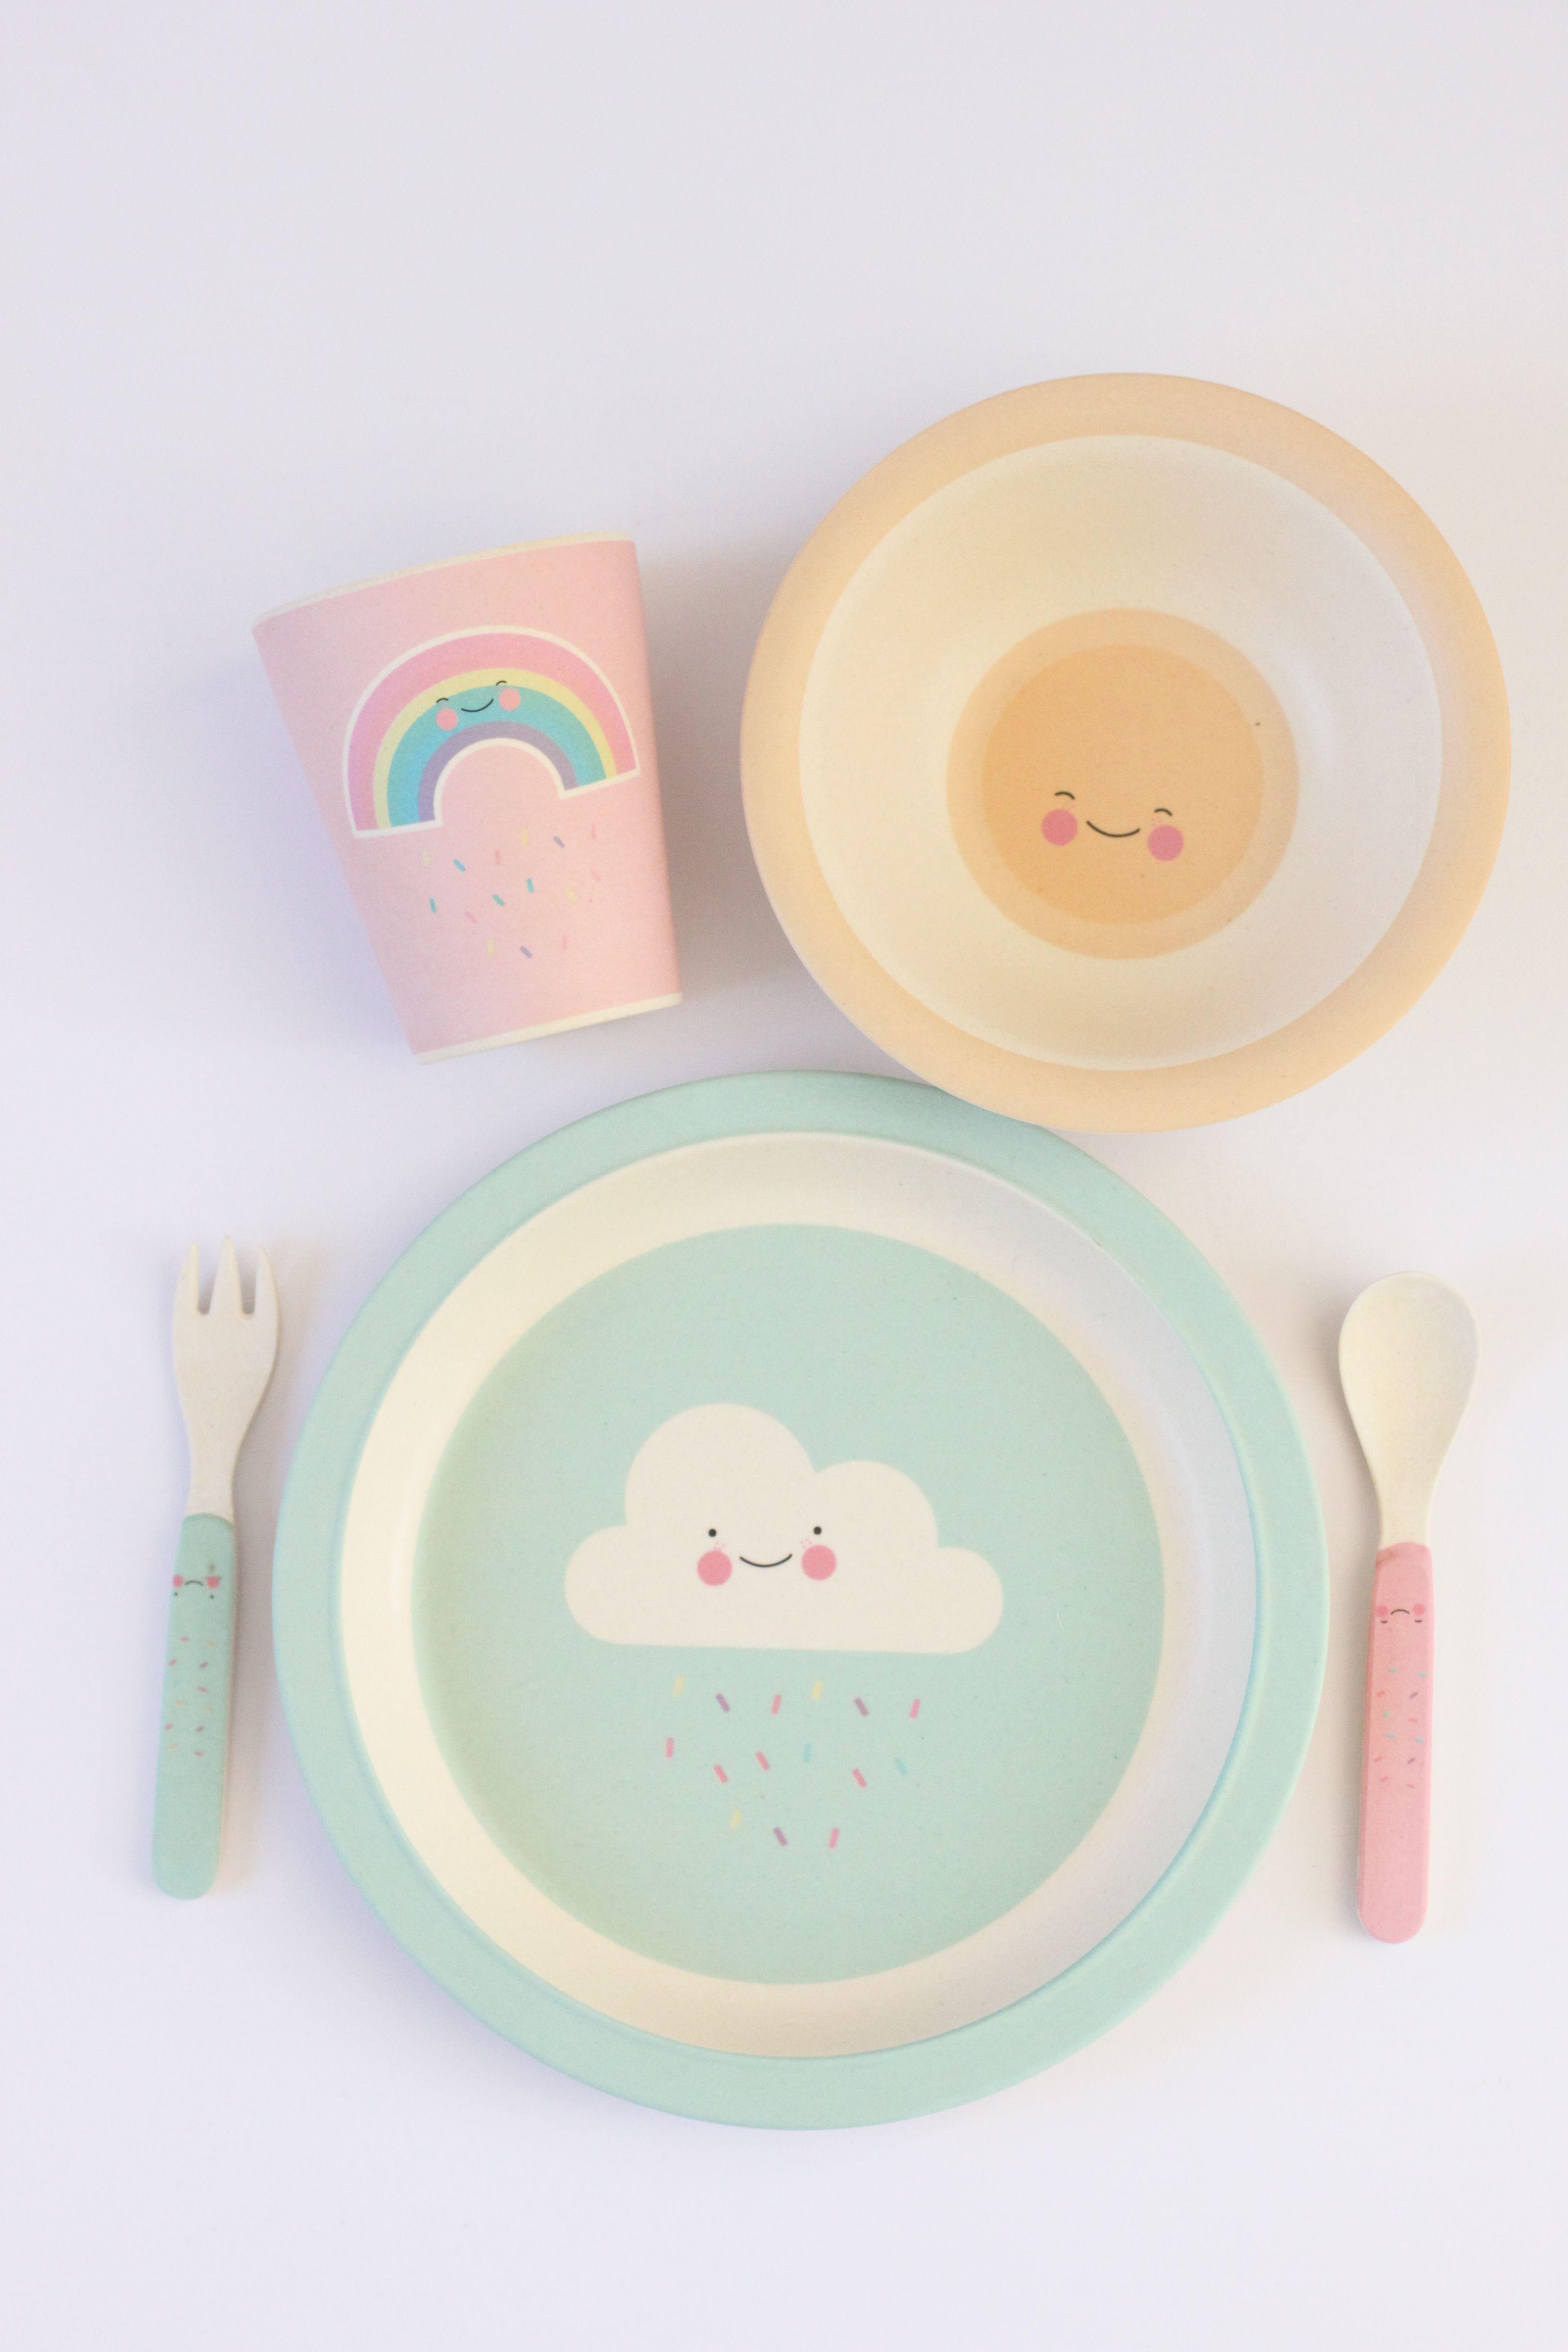 Bamboo Kids Feedingsets Eef Lillemor Kids Tableware Kids Dinnerware Kids Plates Set